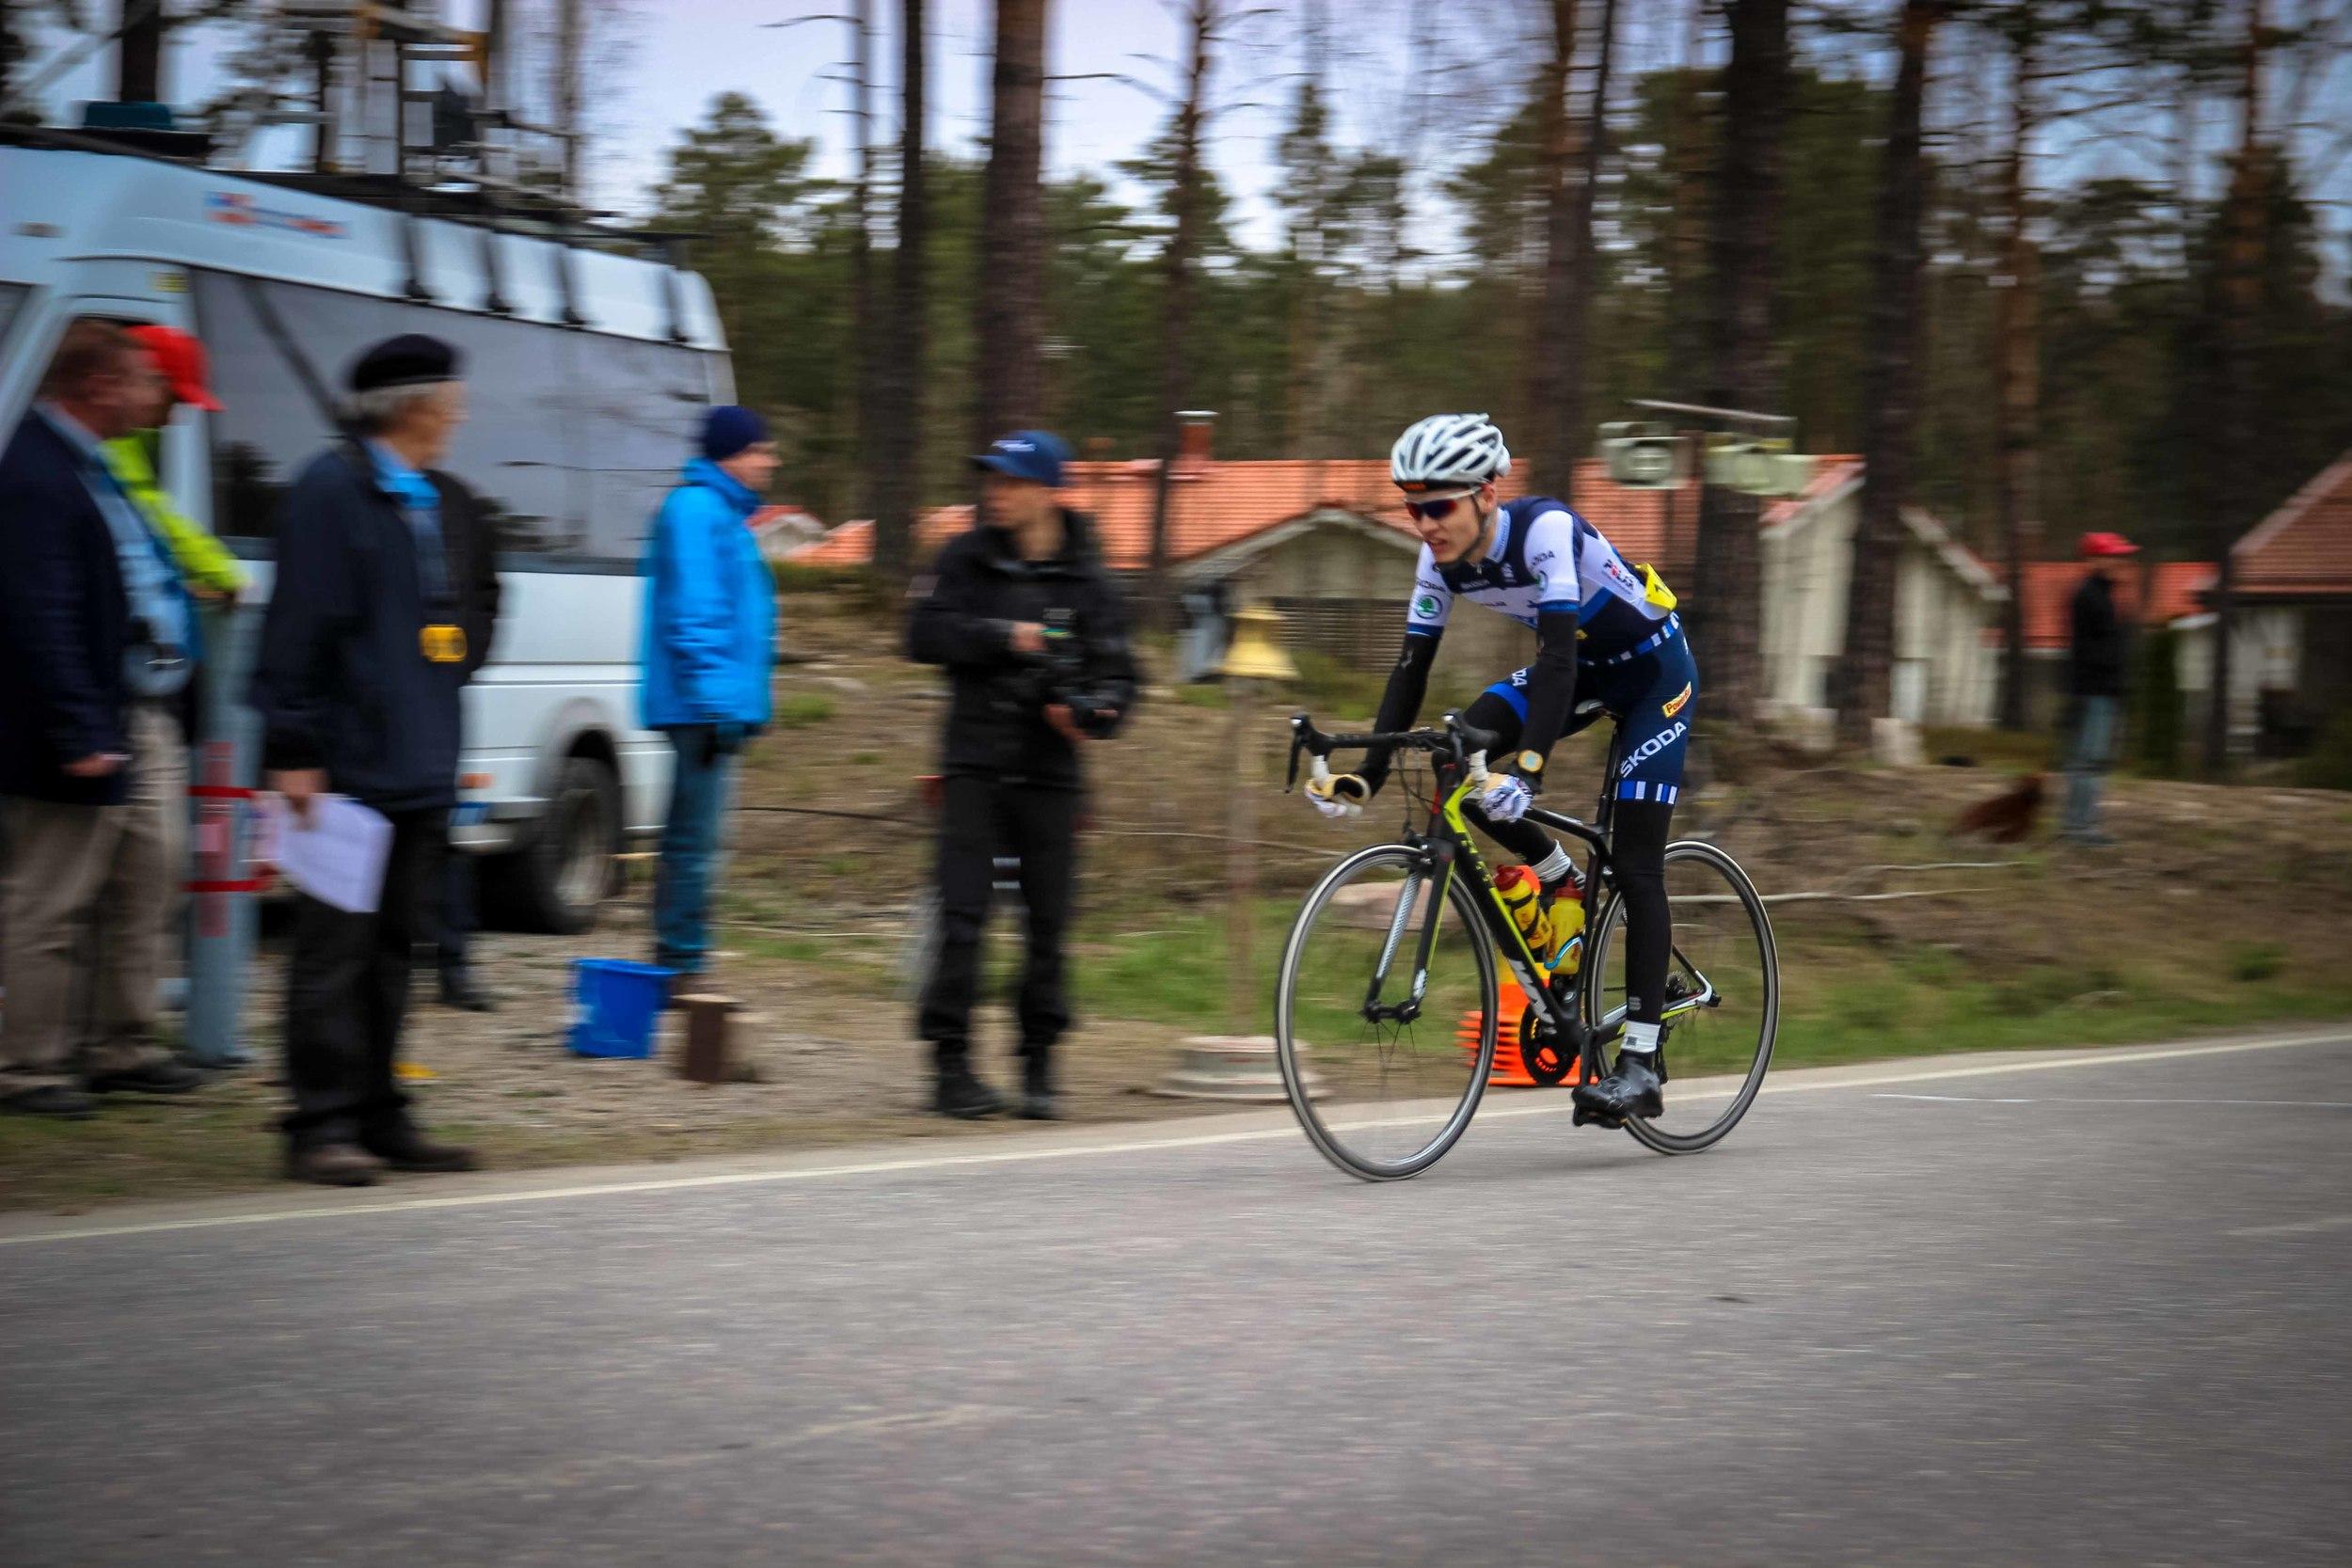 Joel Bergman crossing the finish line just seconds later